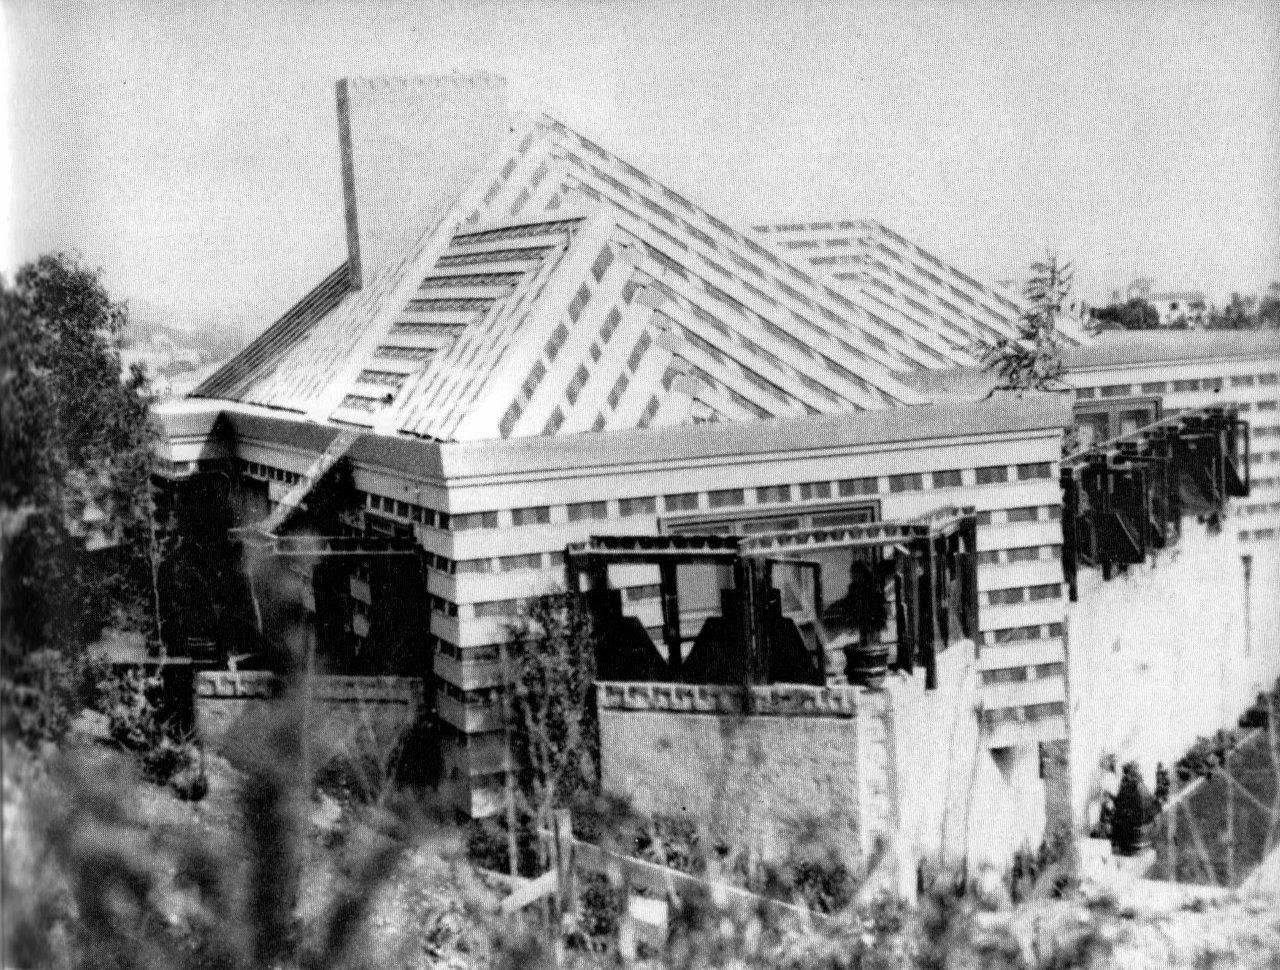 Southern California Architectural History: Tina Modotti, Lloyd